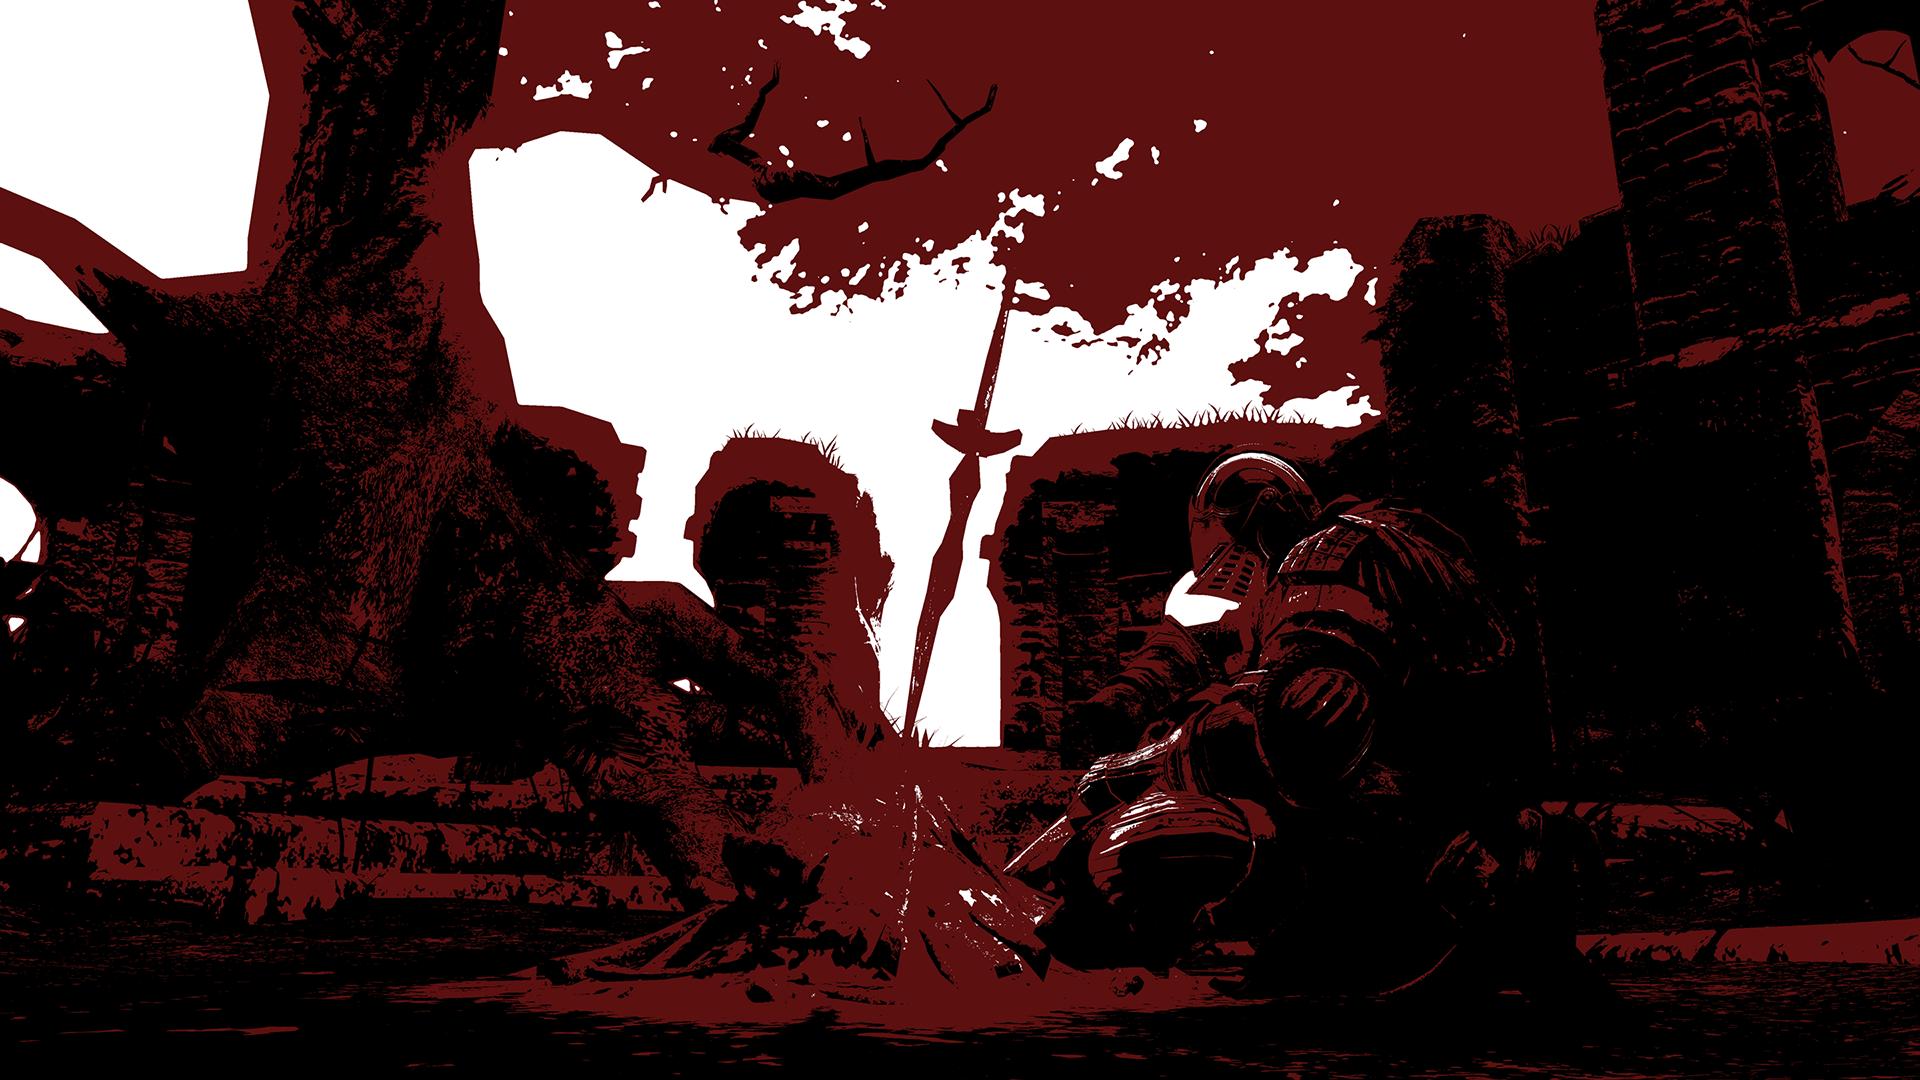 Dark Souls 2 Wallpaper 1080p I converted one of my dark 1920x1080